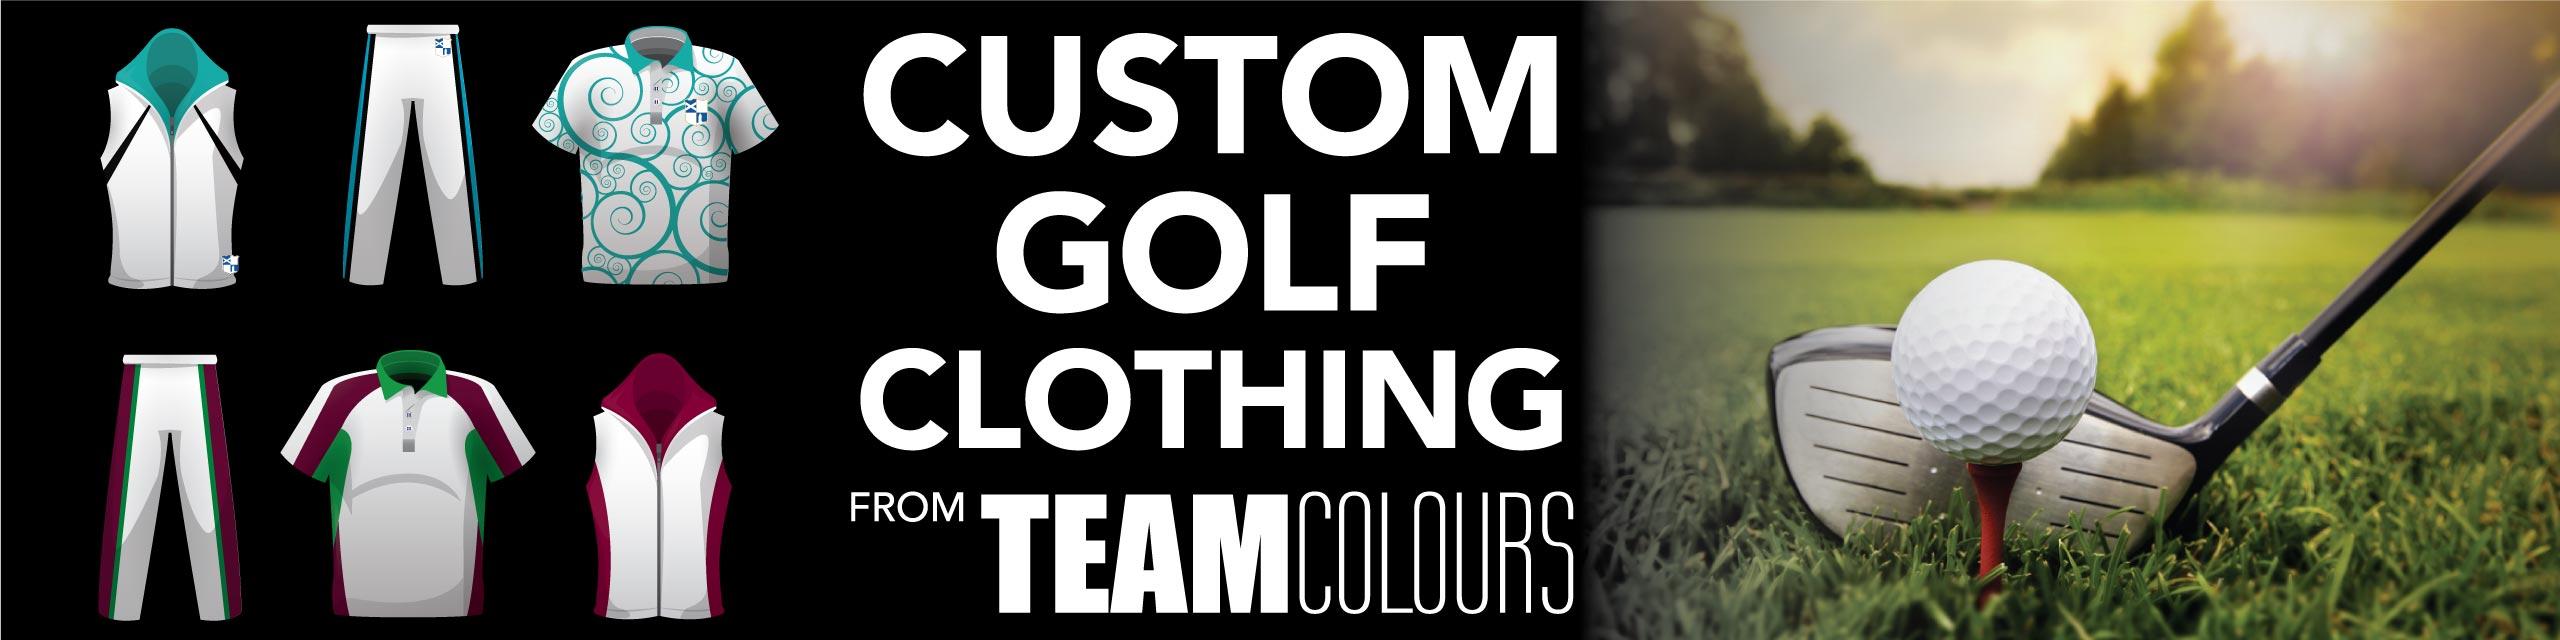 Custom golf shirts tracksuits slipovers and leisurewear for Personalised golf shirts uk